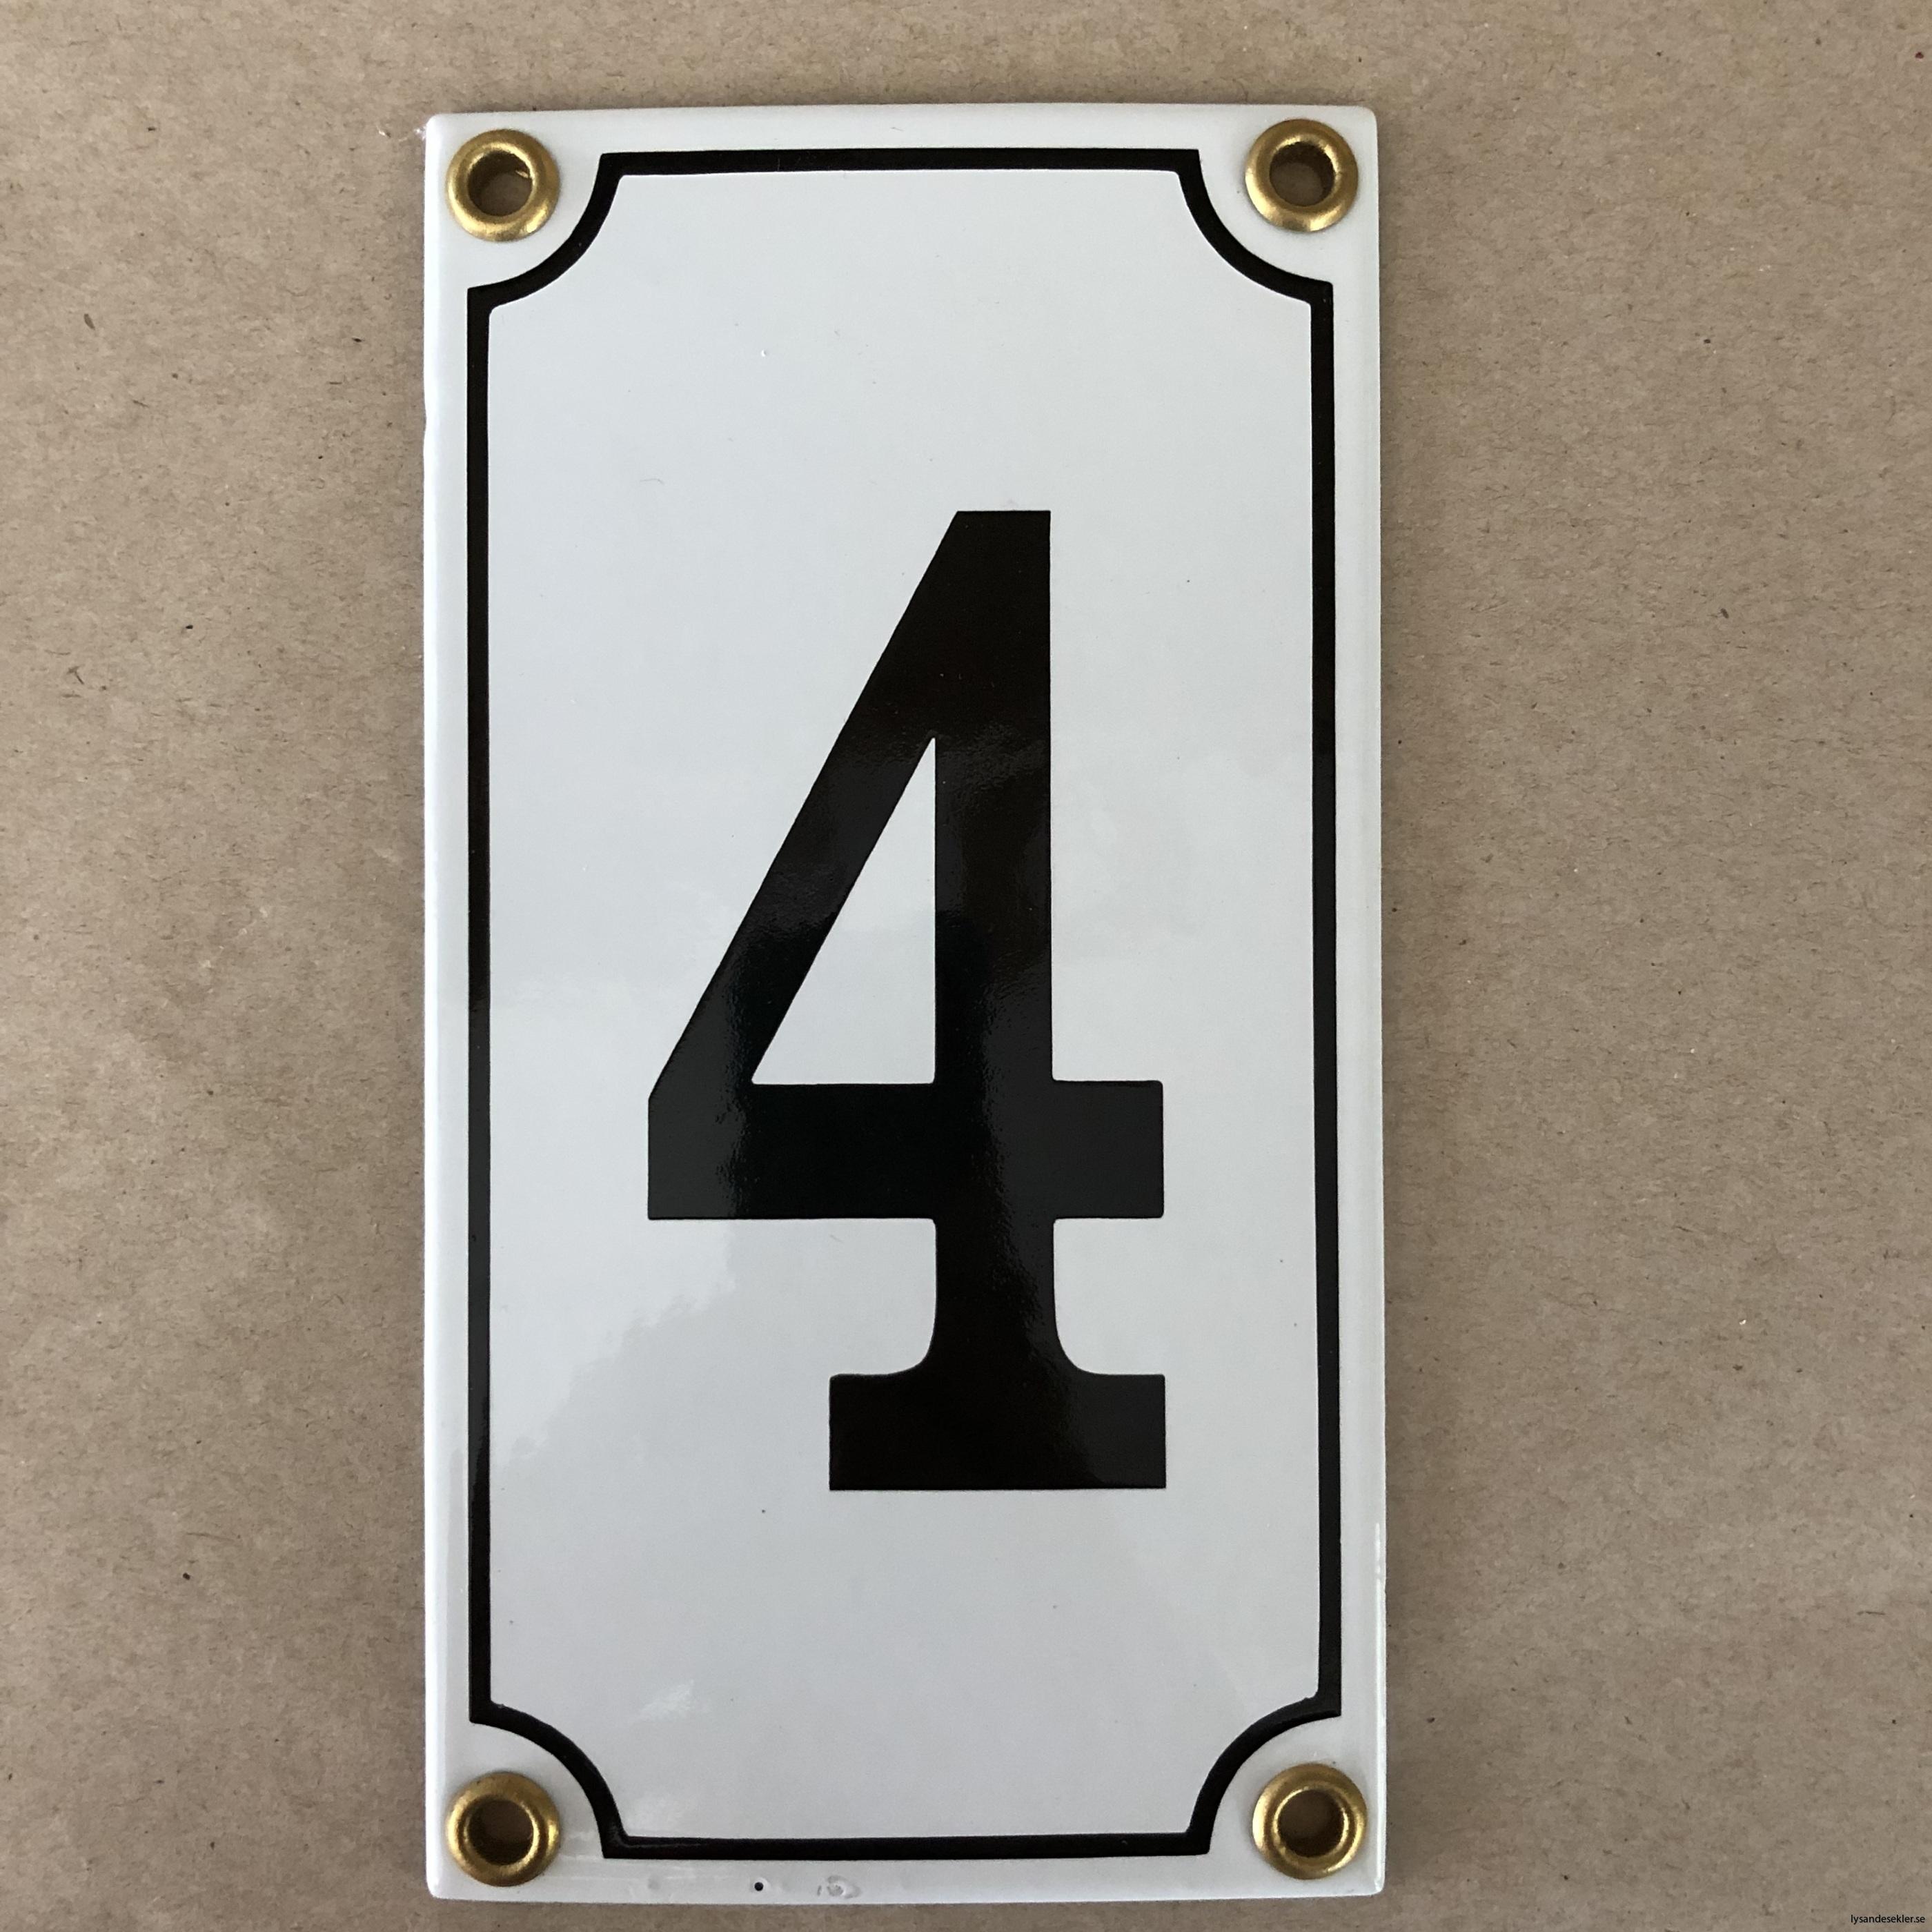 emaljsiffra siffra i emalj fasadsiffra nummer16